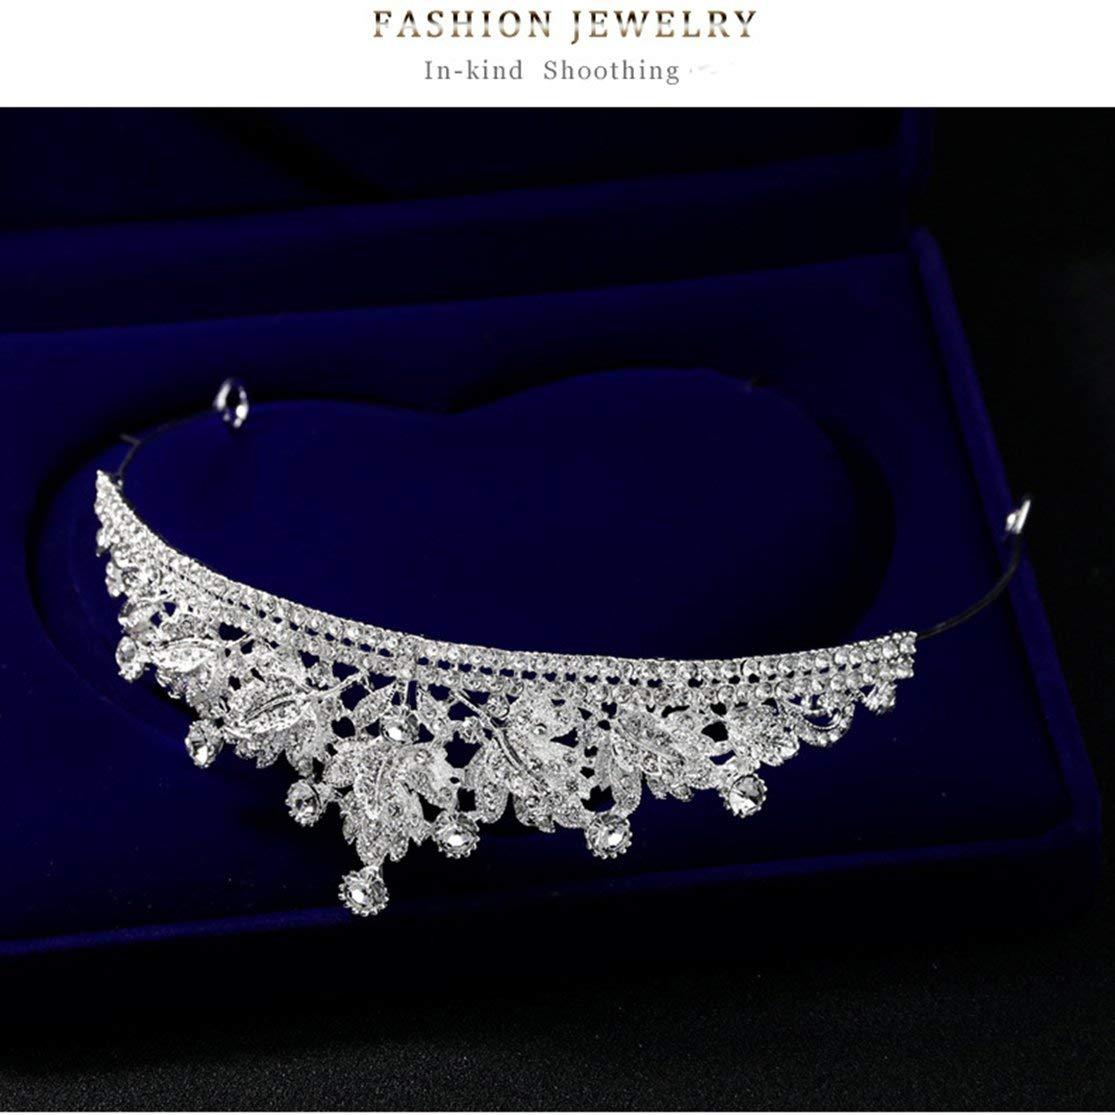 CHANNIKO-UK DA007-A Rhinestone Tiara Headband Crystal Bridal Crown Tiaras Hair Jewelry Wedding Headpiece Hair Accessories